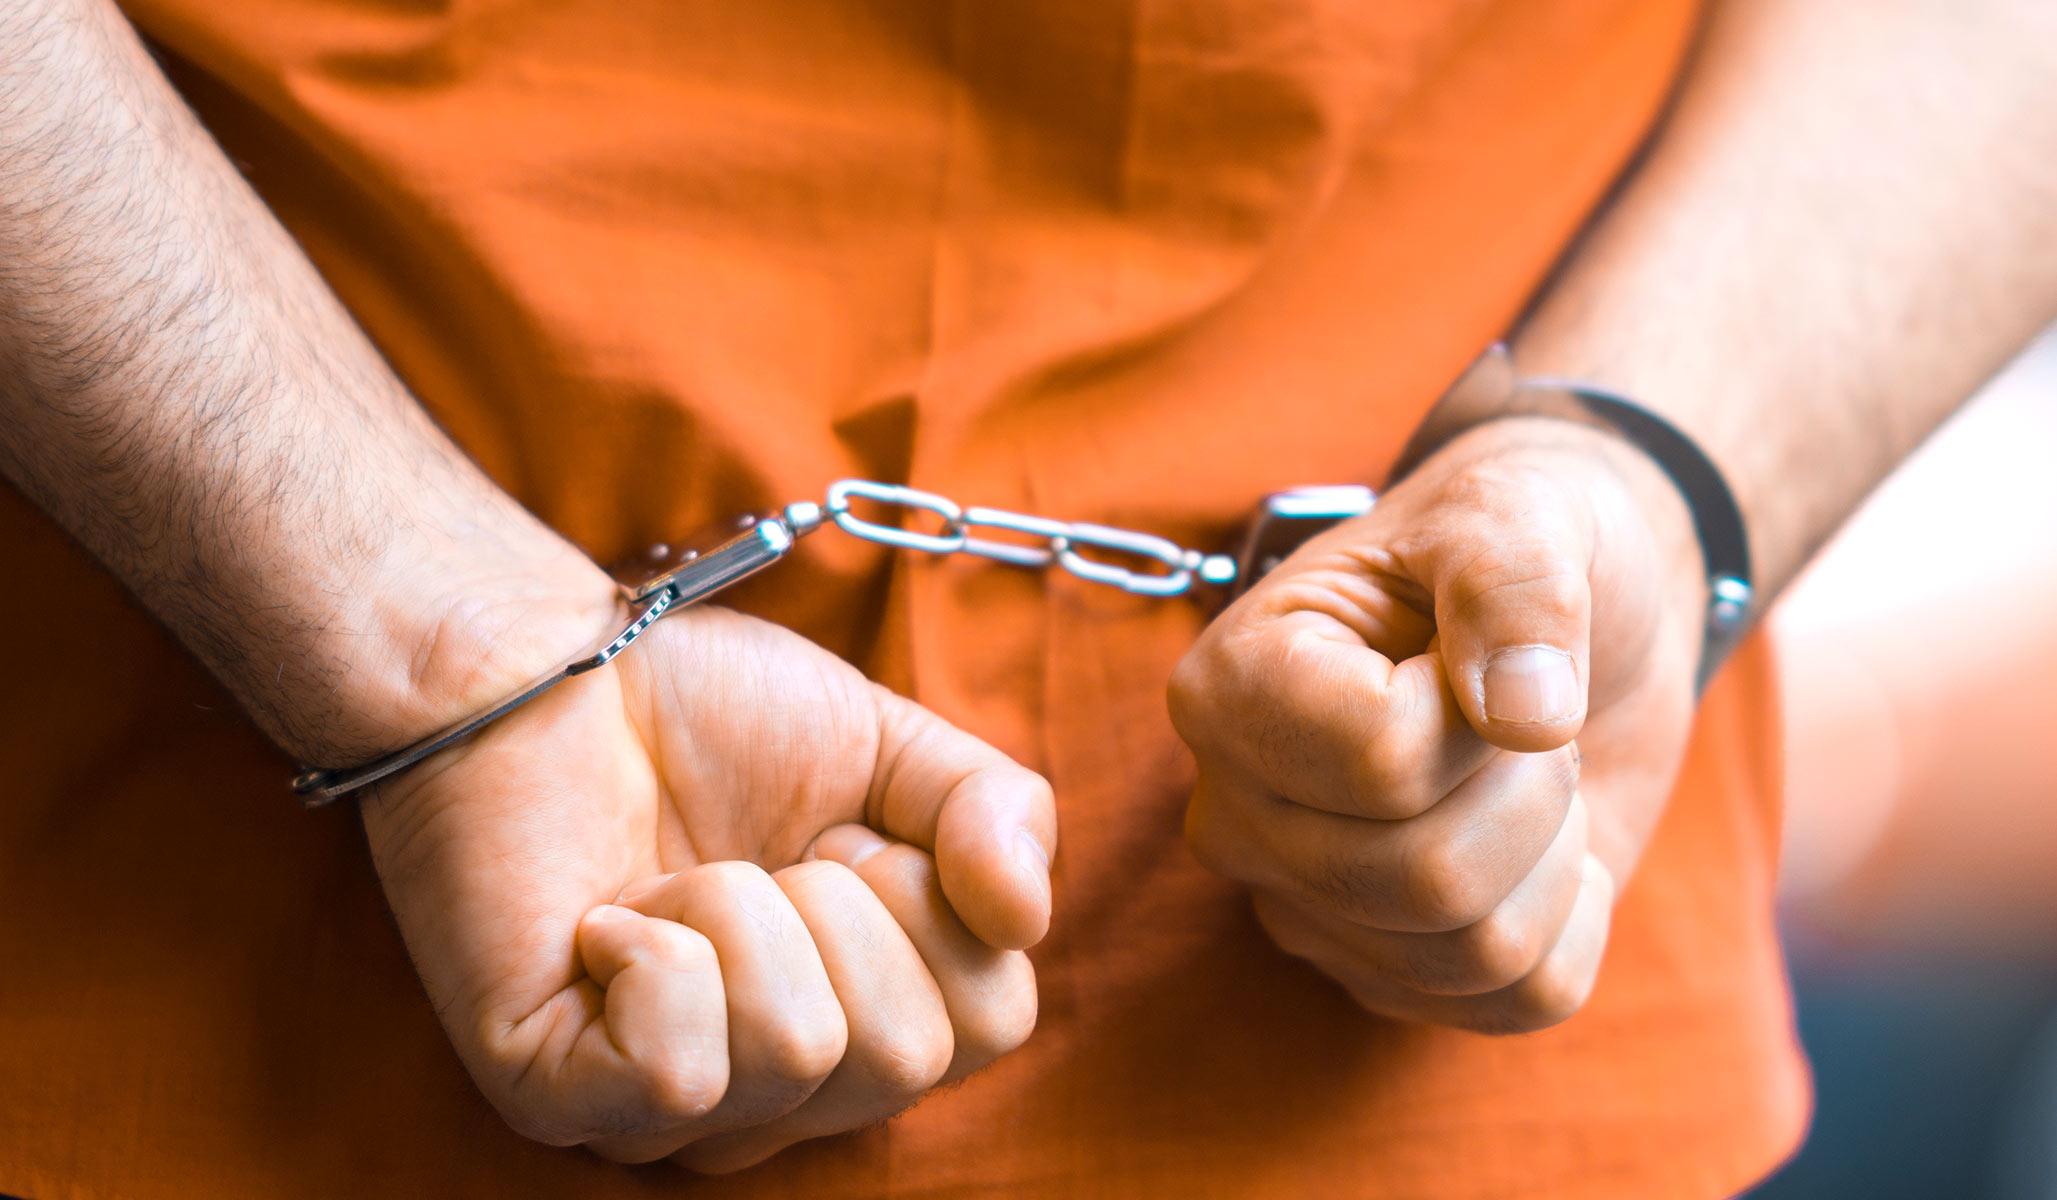 No More Jailbreaks